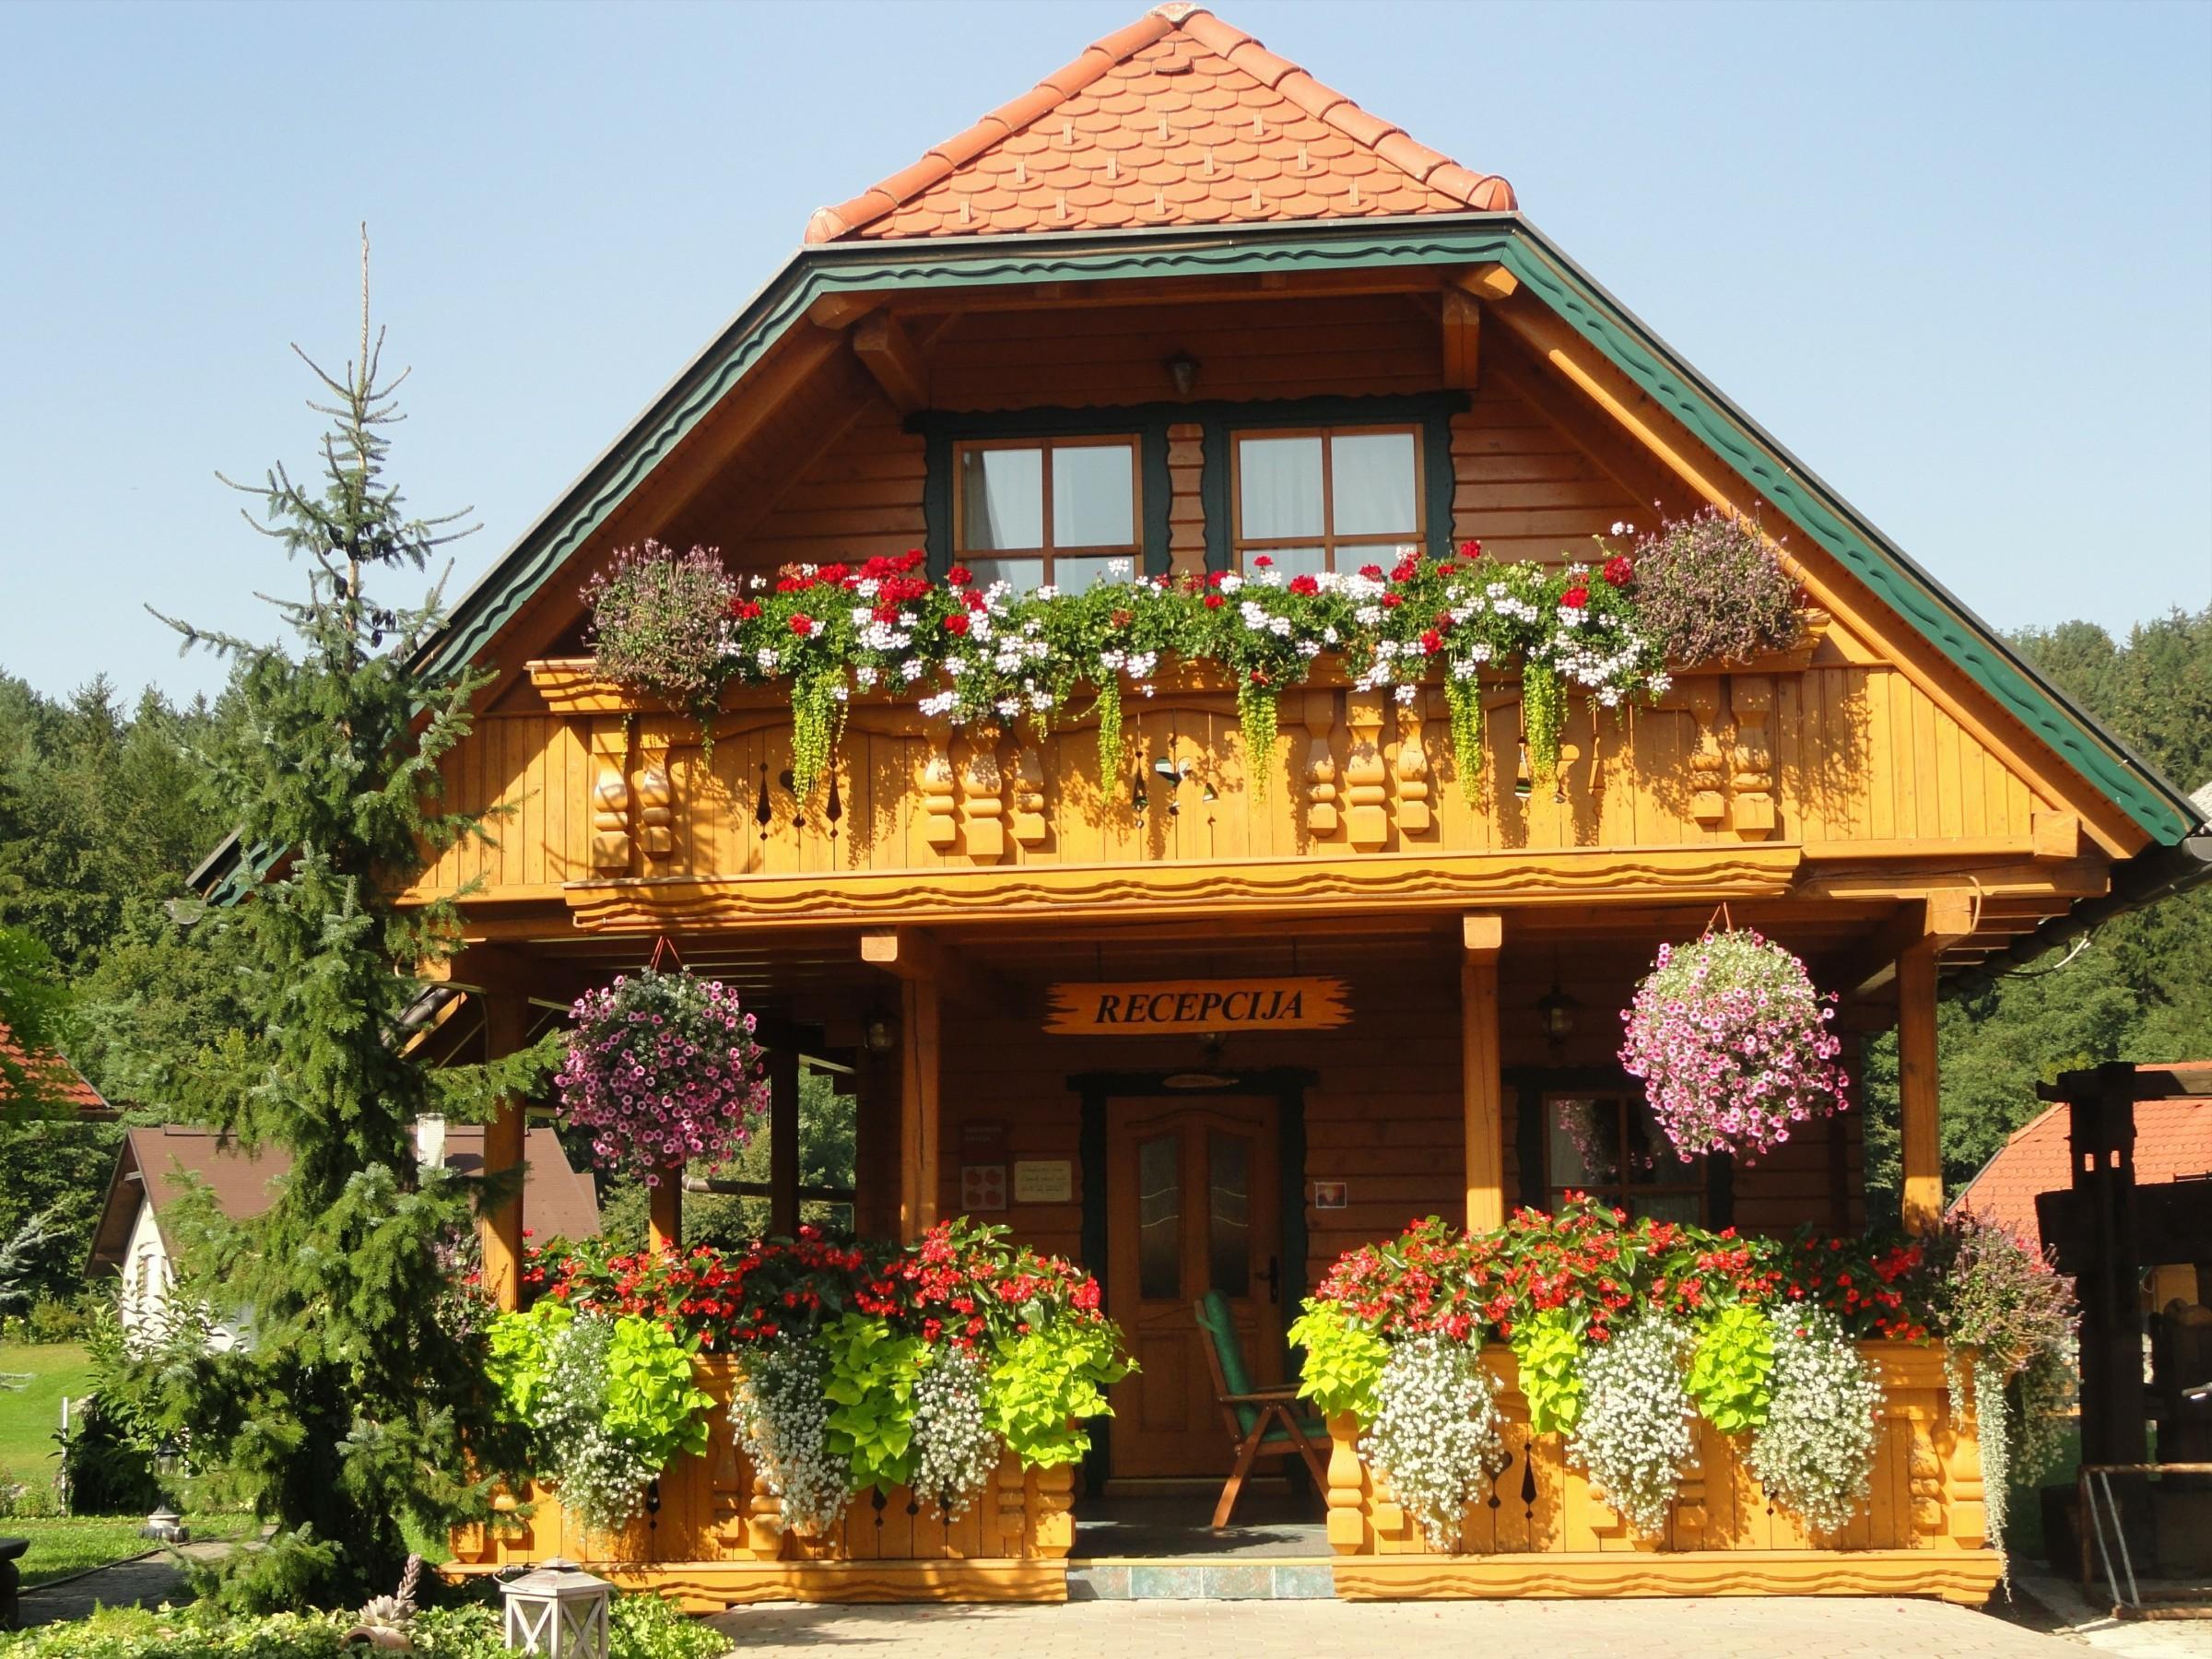 FormatFactoryA.Koroτec-recepcija, zeleni apartma, foto arhiv Koroτec, Savinjska dolina